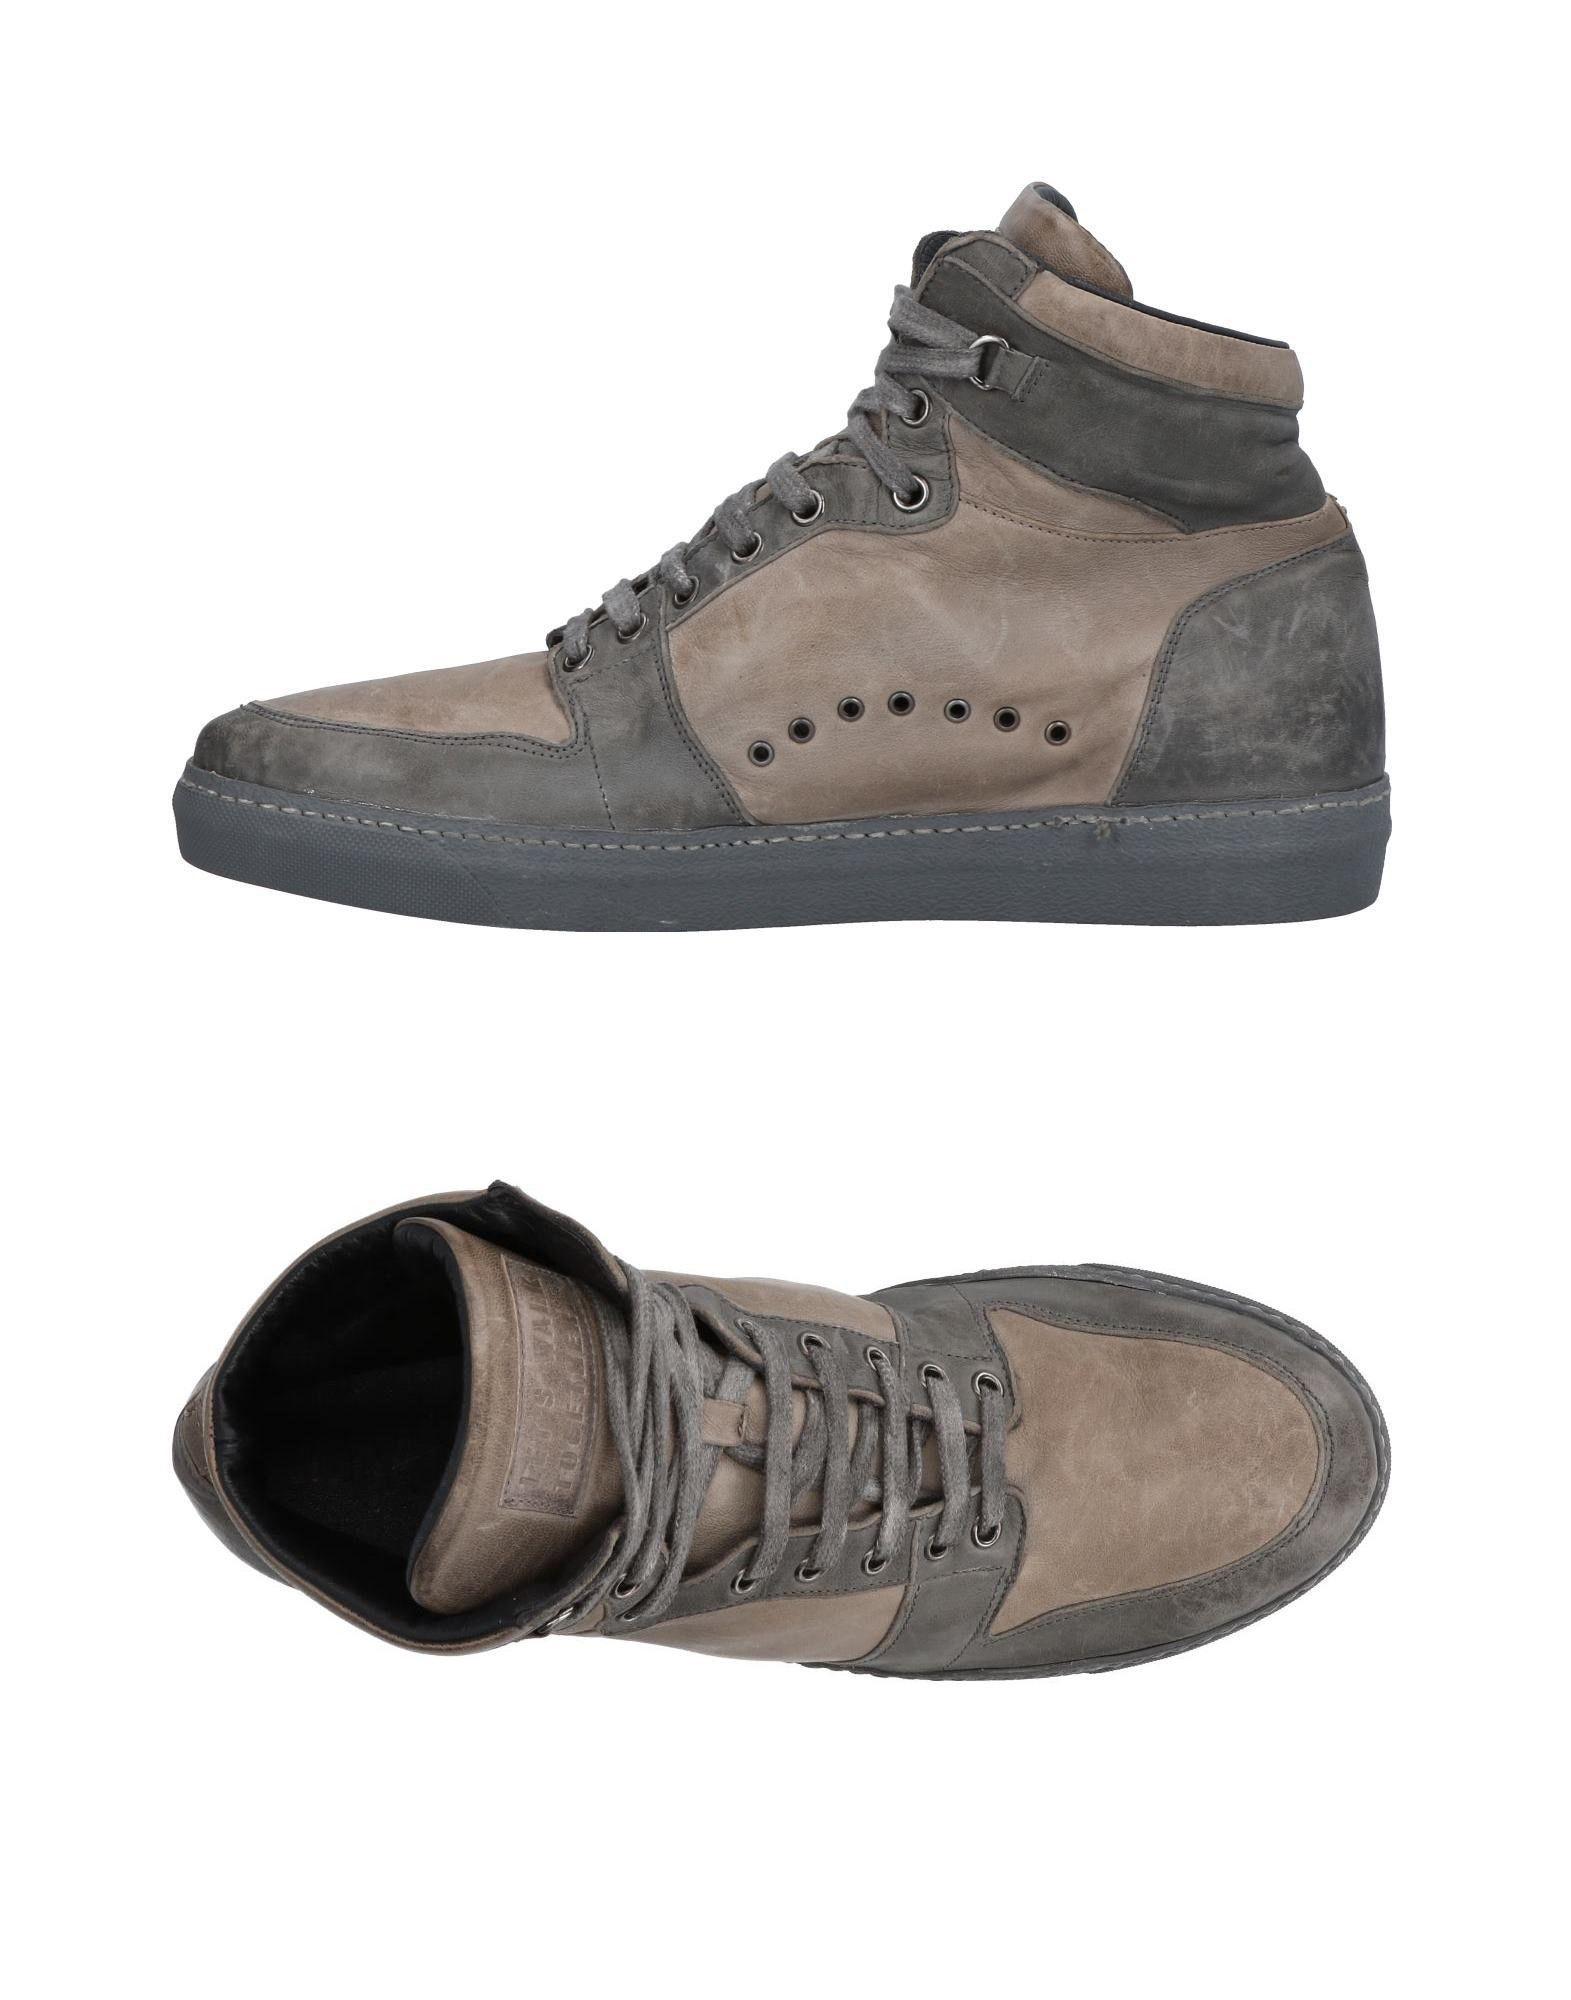 Giorgio Brato Sneakers Herren  11461532FT Gute Qualität beliebte Schuhe